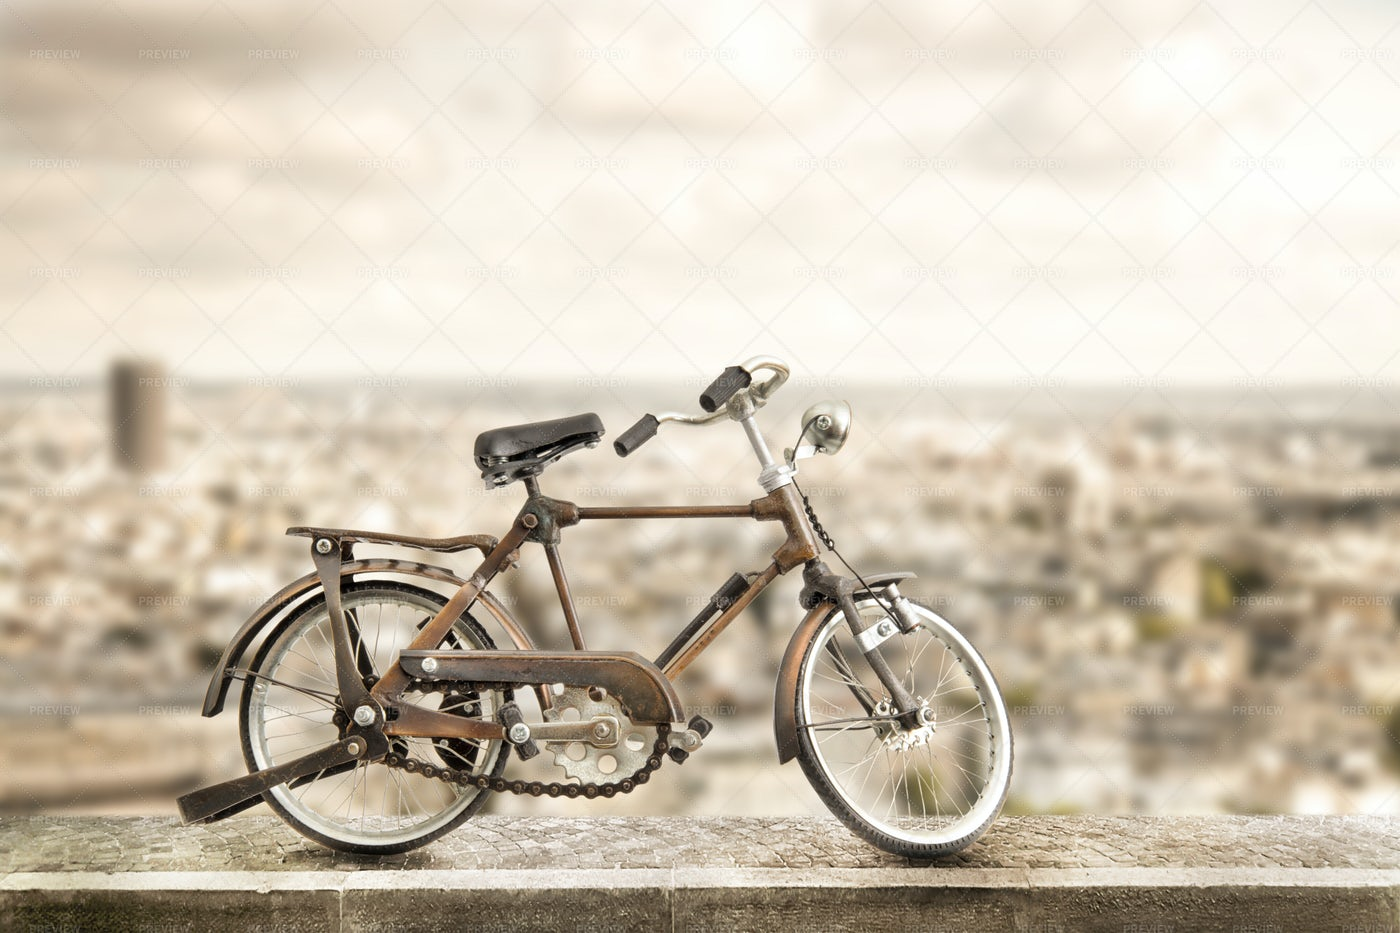 Bicycle In Urban Sidewalk: Stock Photos